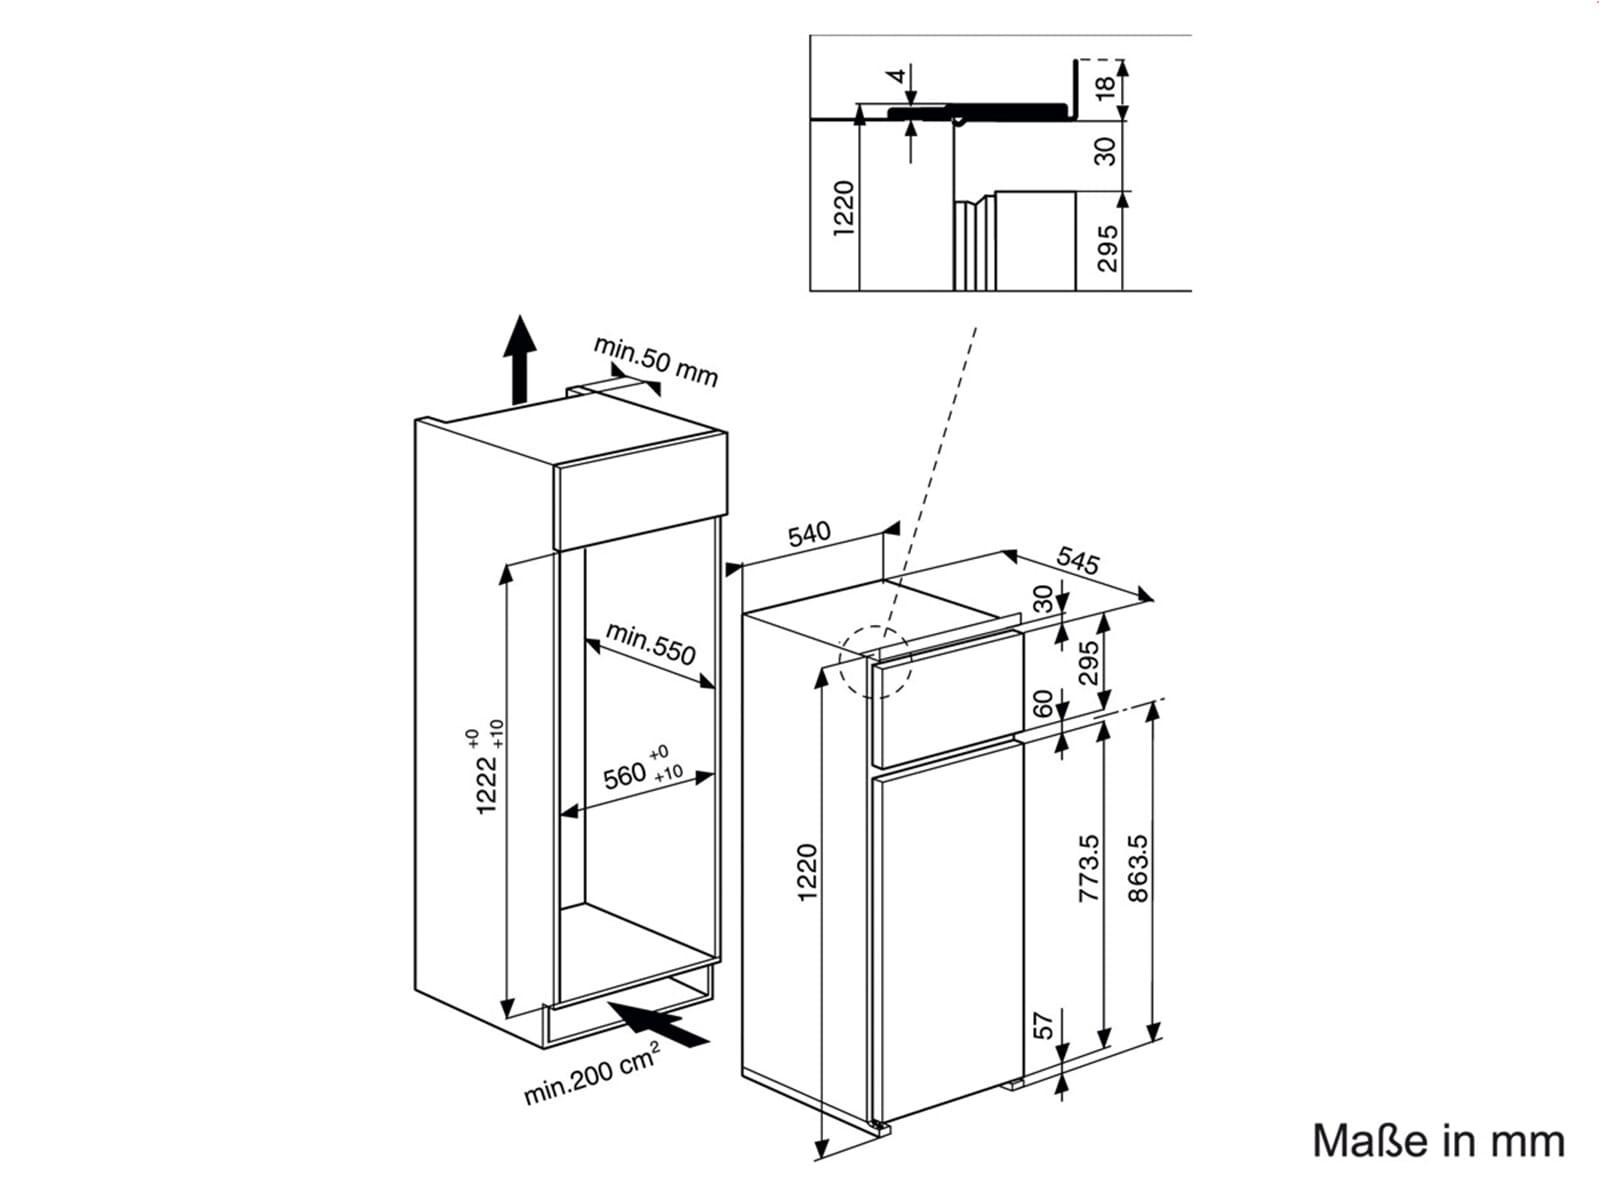 privileg prt 375 a einbau k hl gefrierkombination. Black Bedroom Furniture Sets. Home Design Ideas